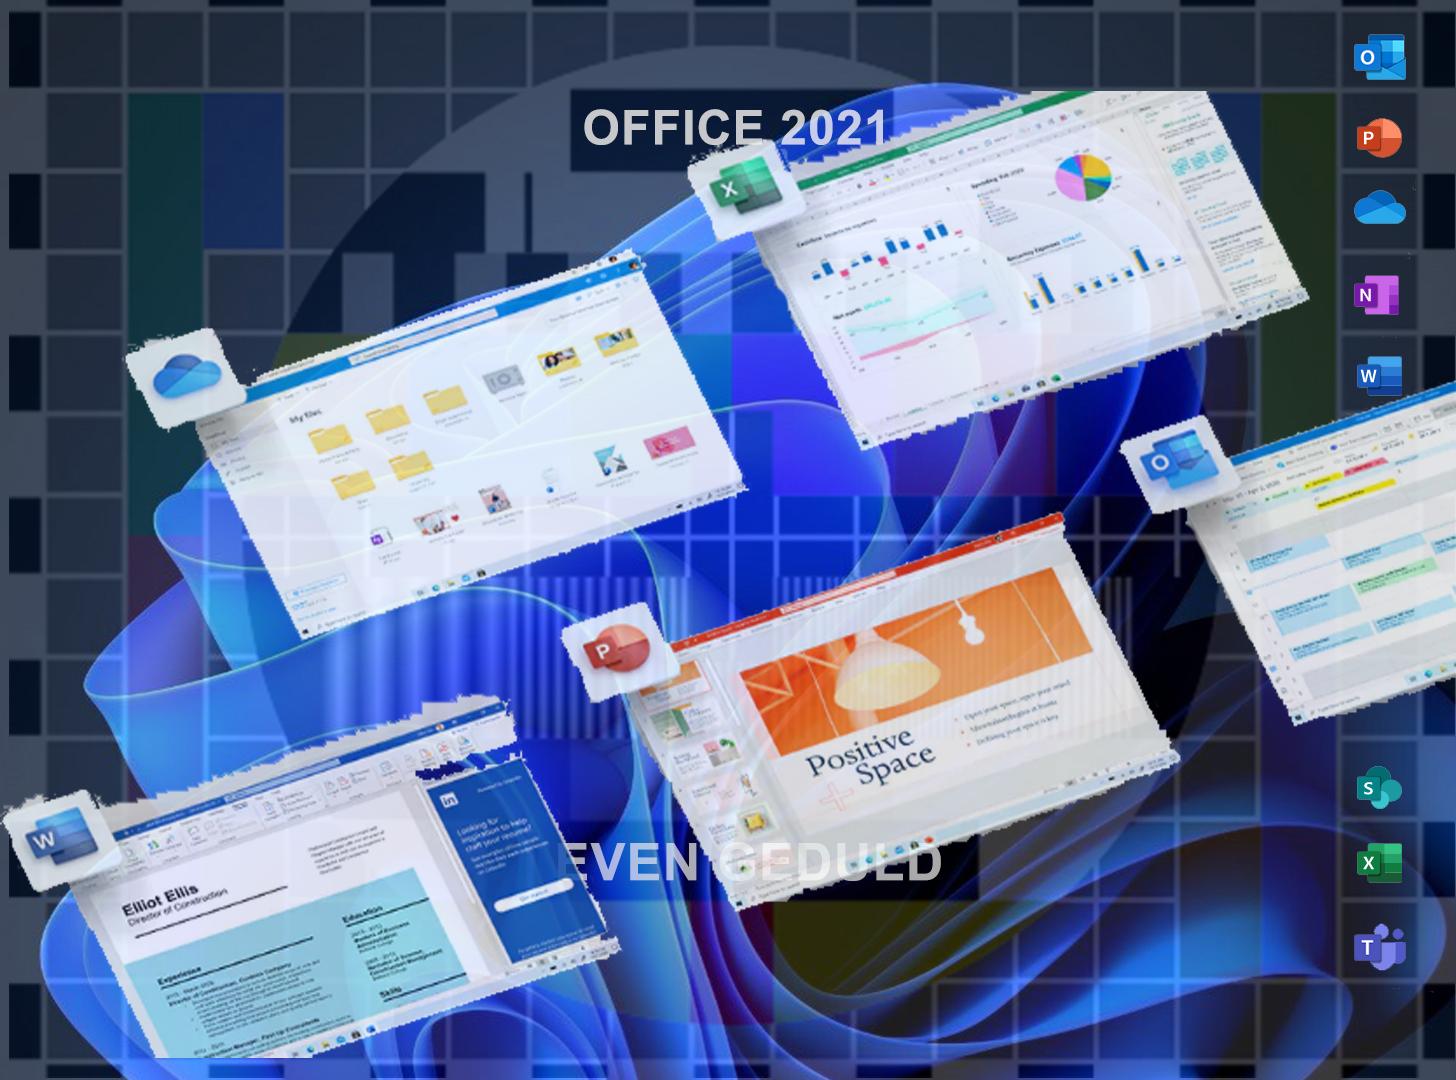 office 2021 windows 11